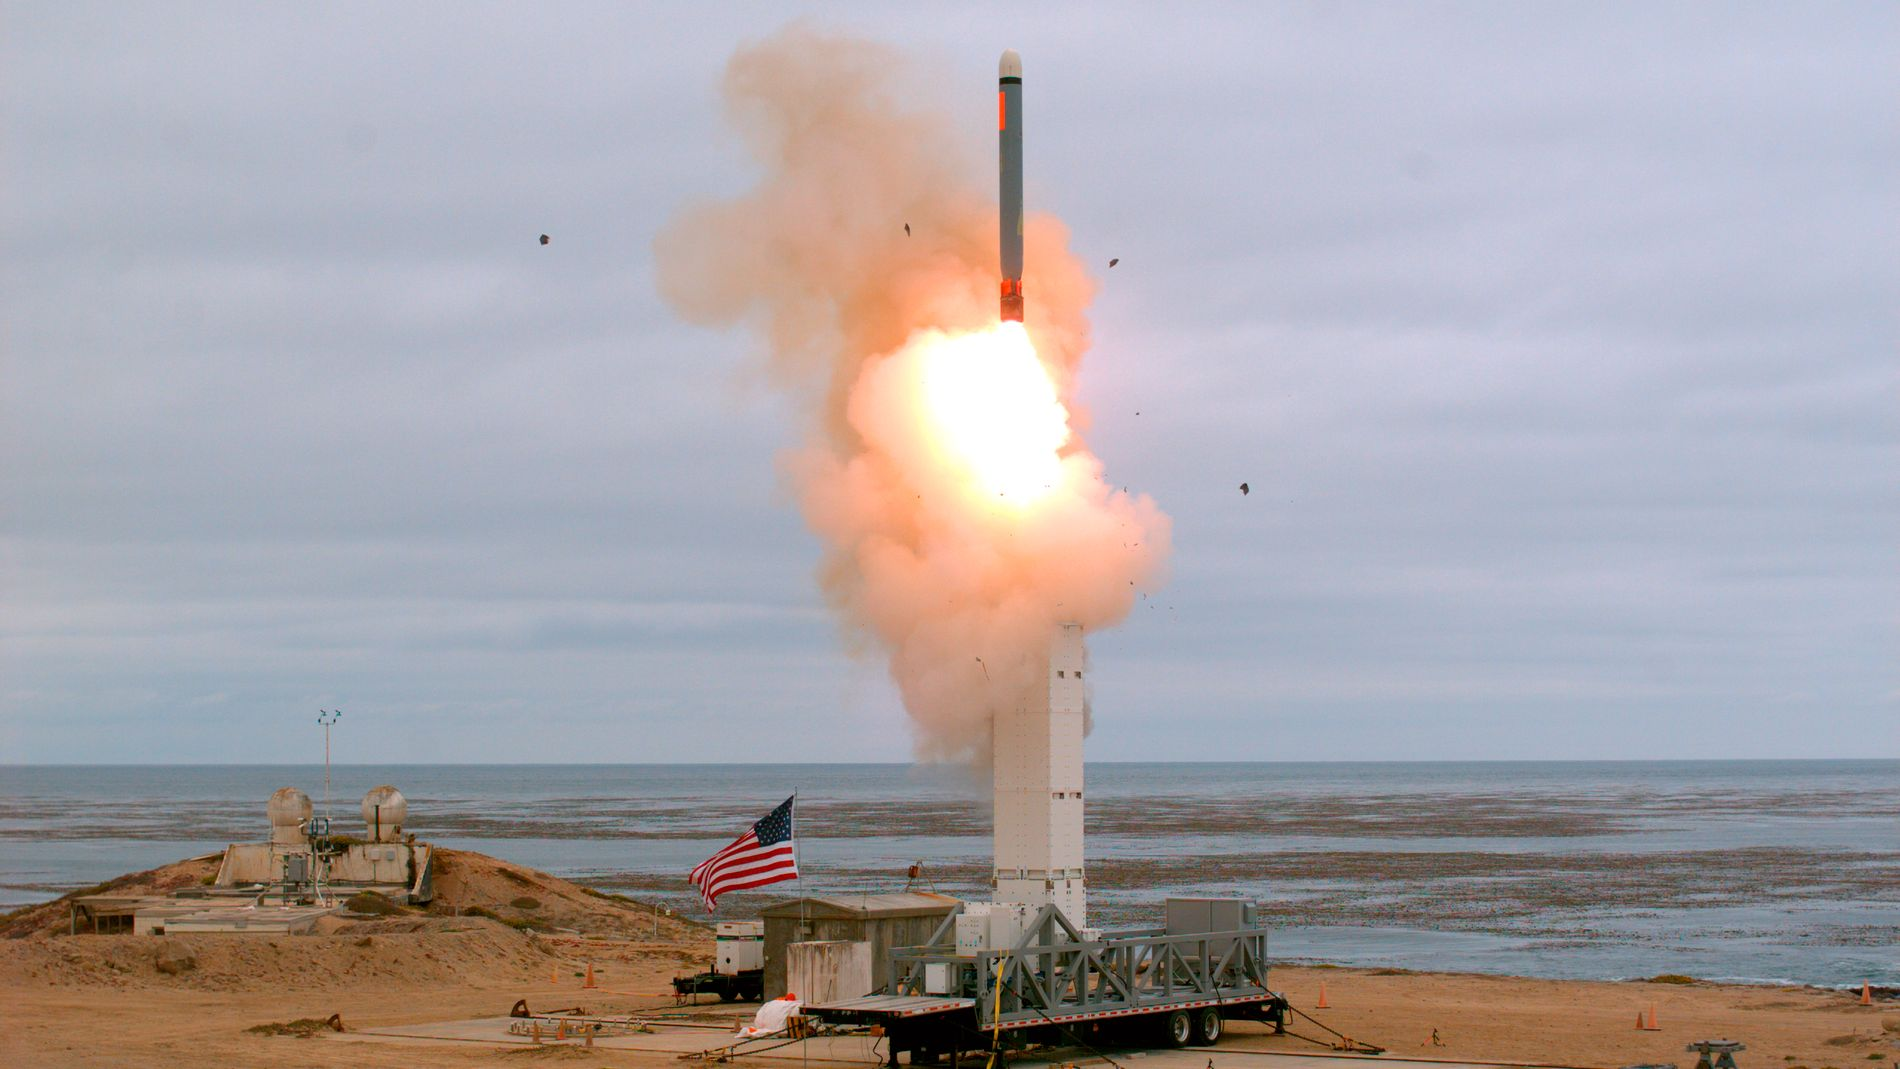 TEST: USA prøveskjøt søndag en mellomdistanserakett, som traff mål 500 kilometer unna. Foto: